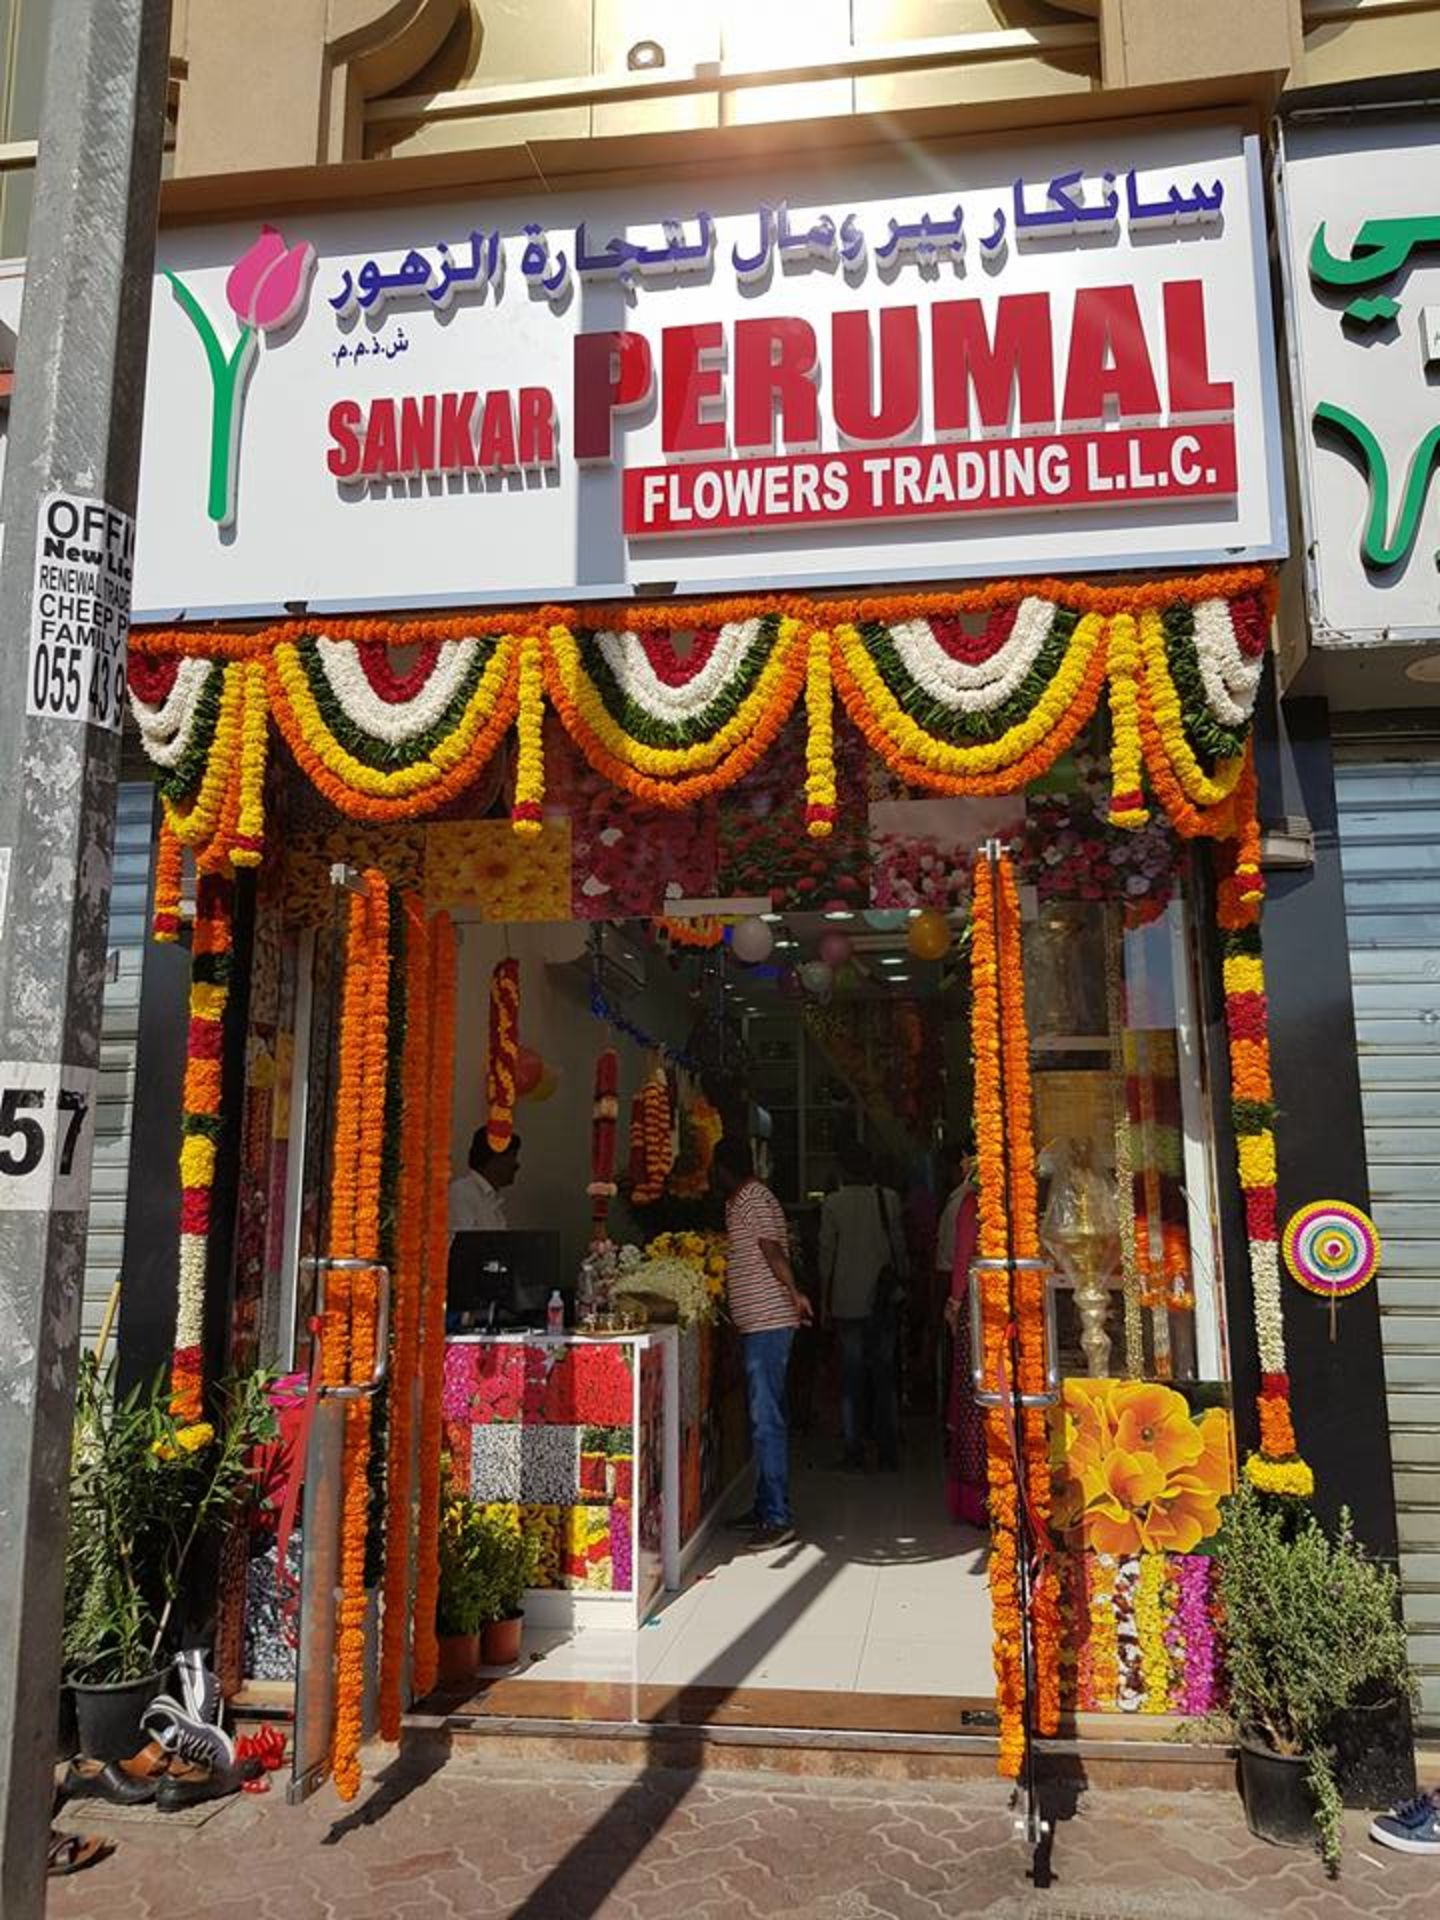 HiDubai-business-sankar-perumal-flowers-trading-b2b-services-distributors-wholesalers-meena-bazar-al-souq-al-kabeer-dubai